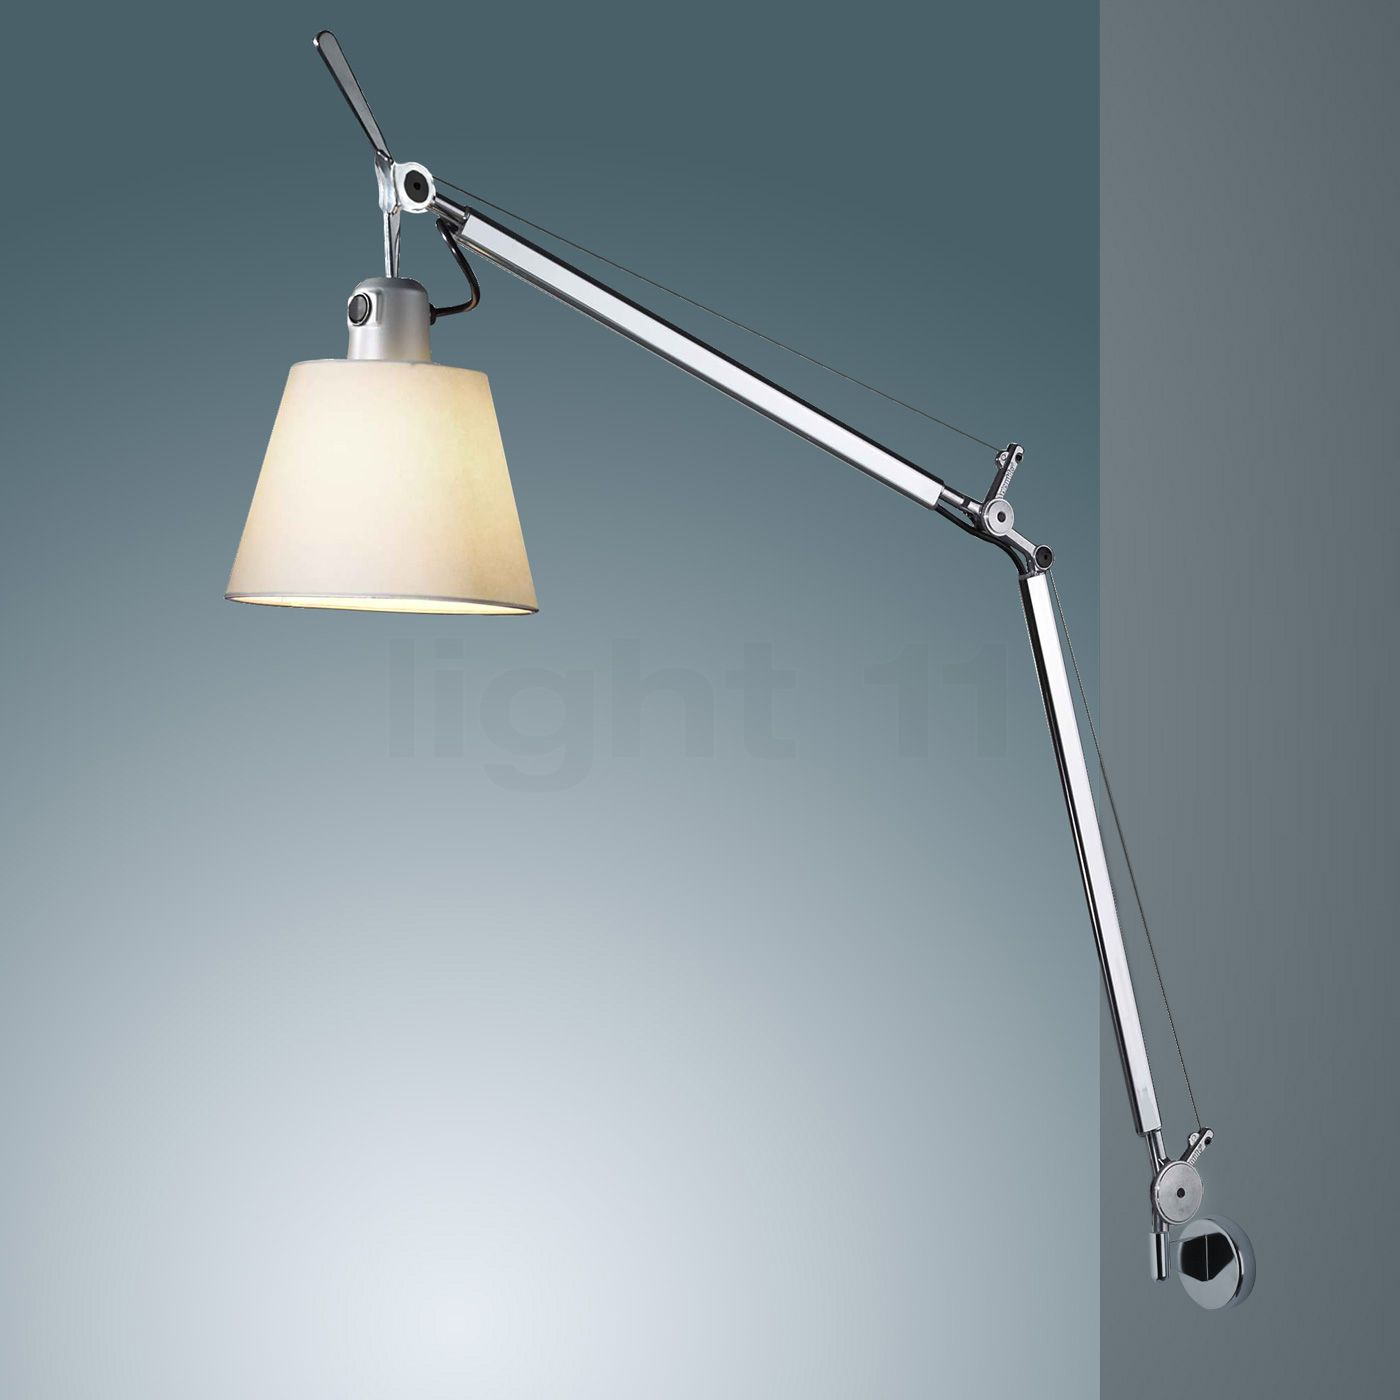 Artemide Tolomeo Basculante Parete   Light11.it